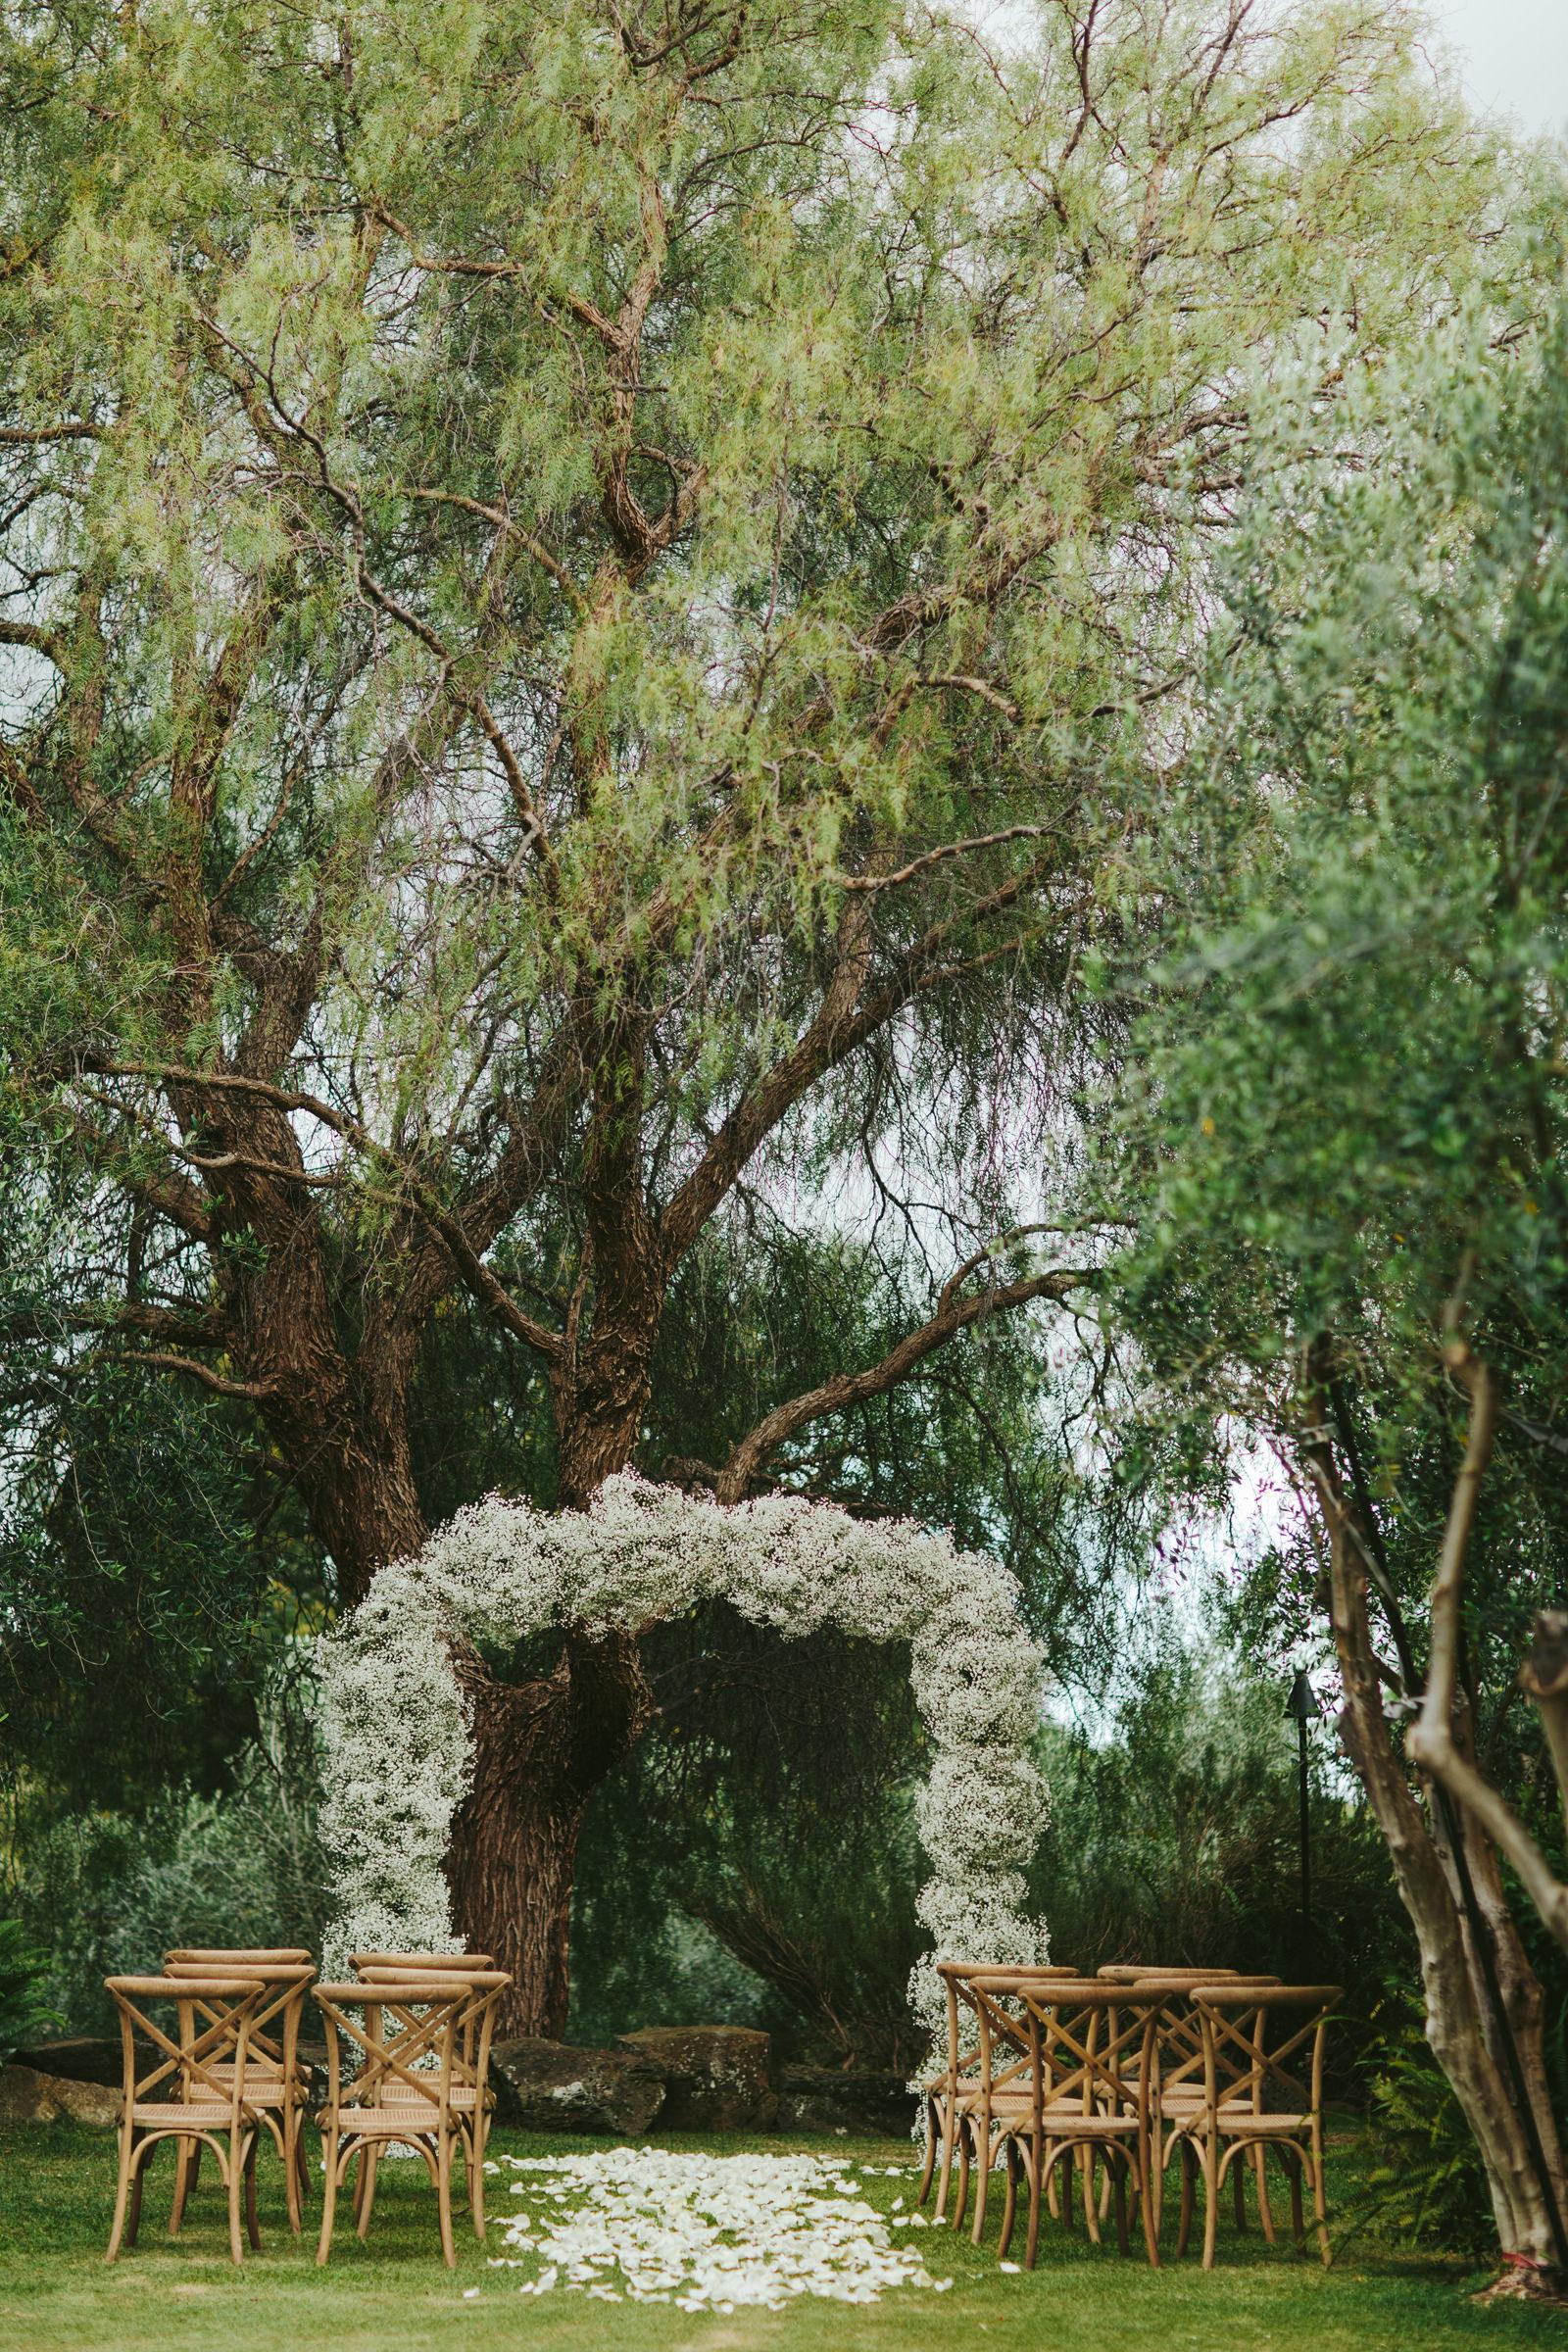 calasa-olive-farm-maui-floral-arbor-against-trees-melia-lucida